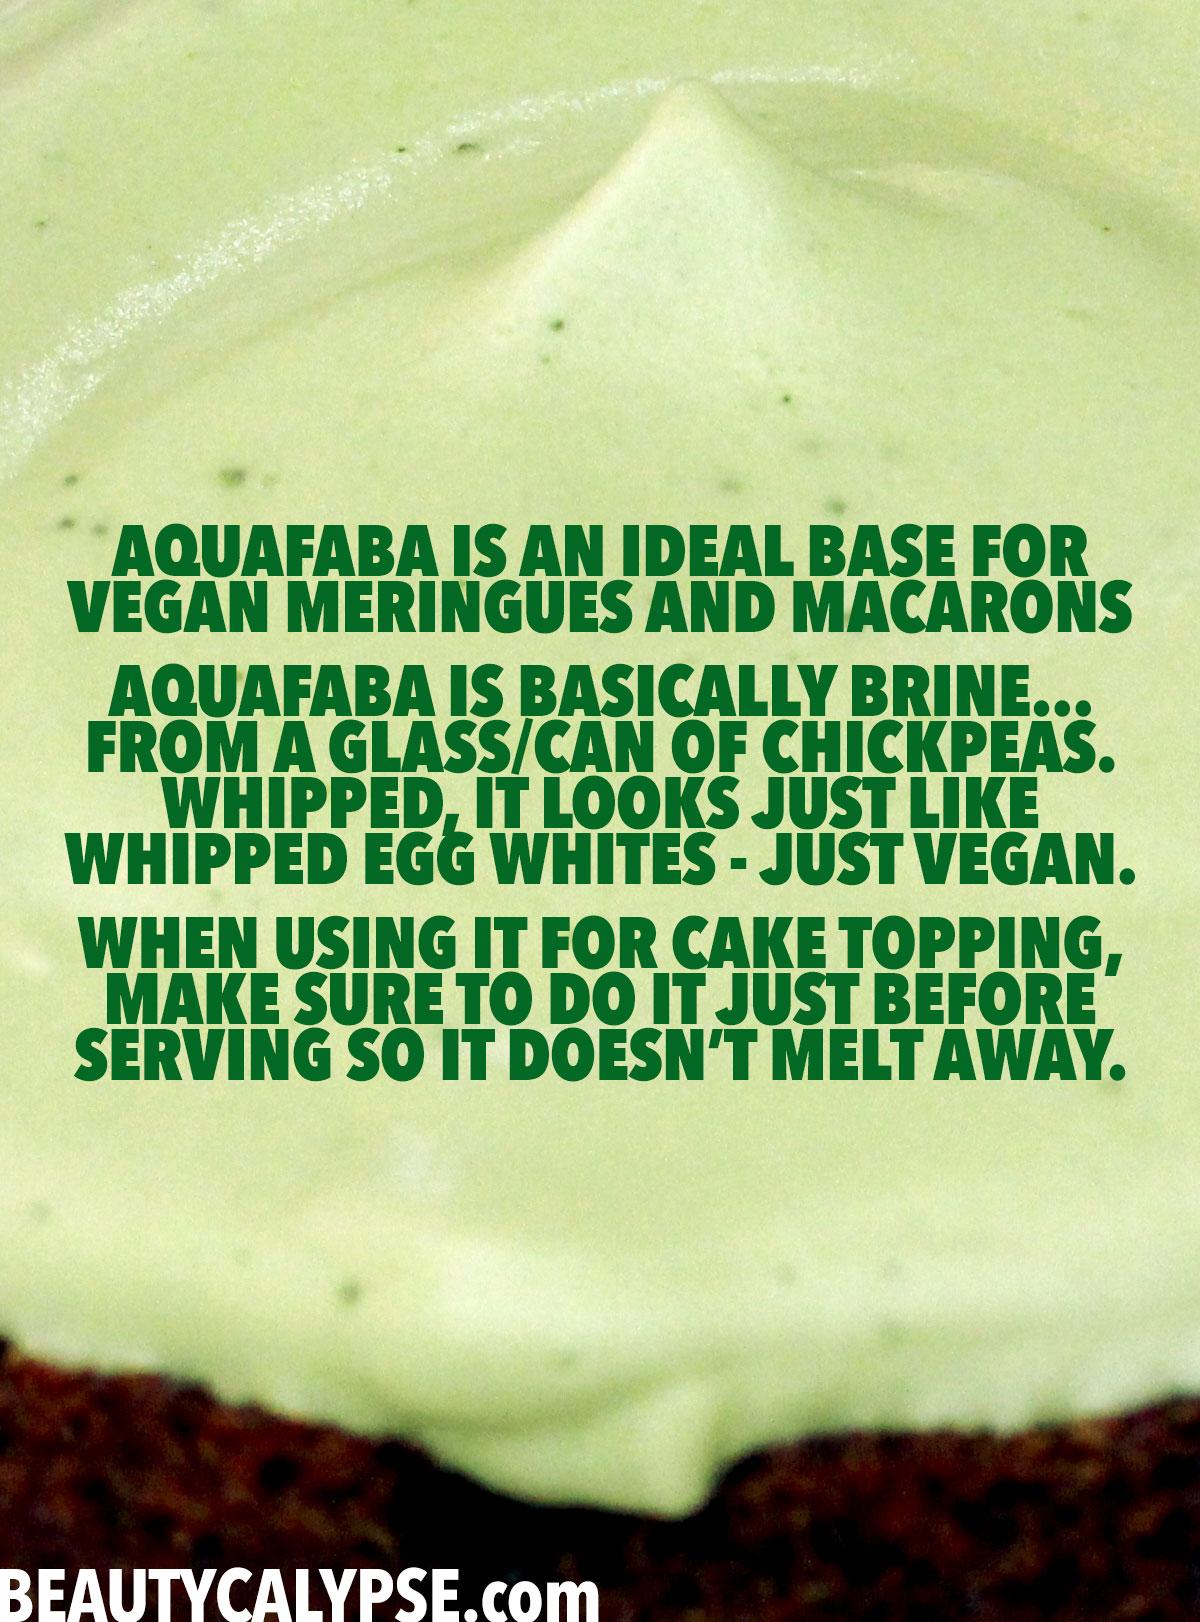 aquafaba-matcha-cake-topping